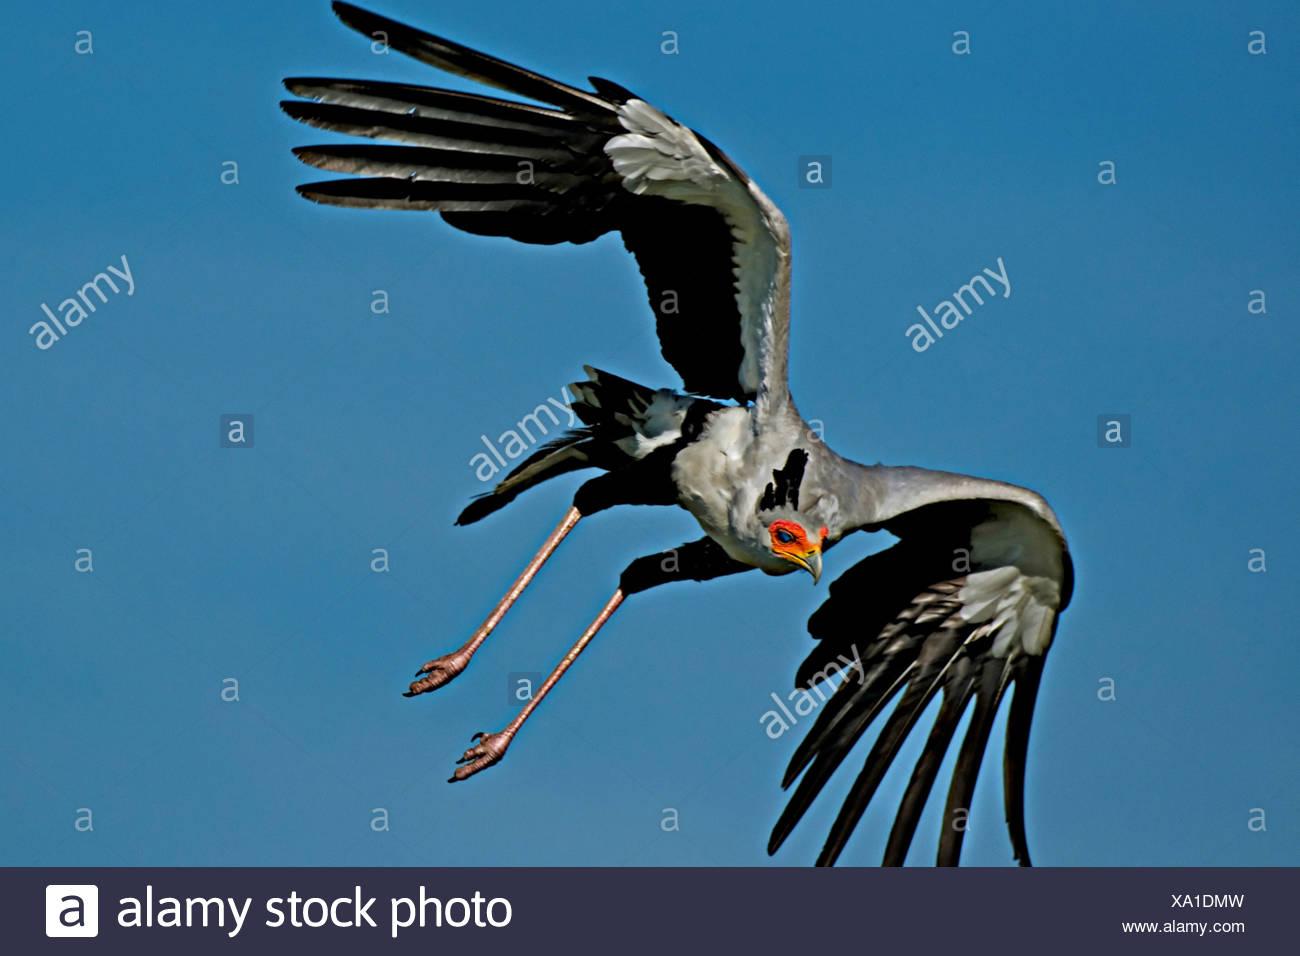 Secretary Bird in Flight Stock Photo